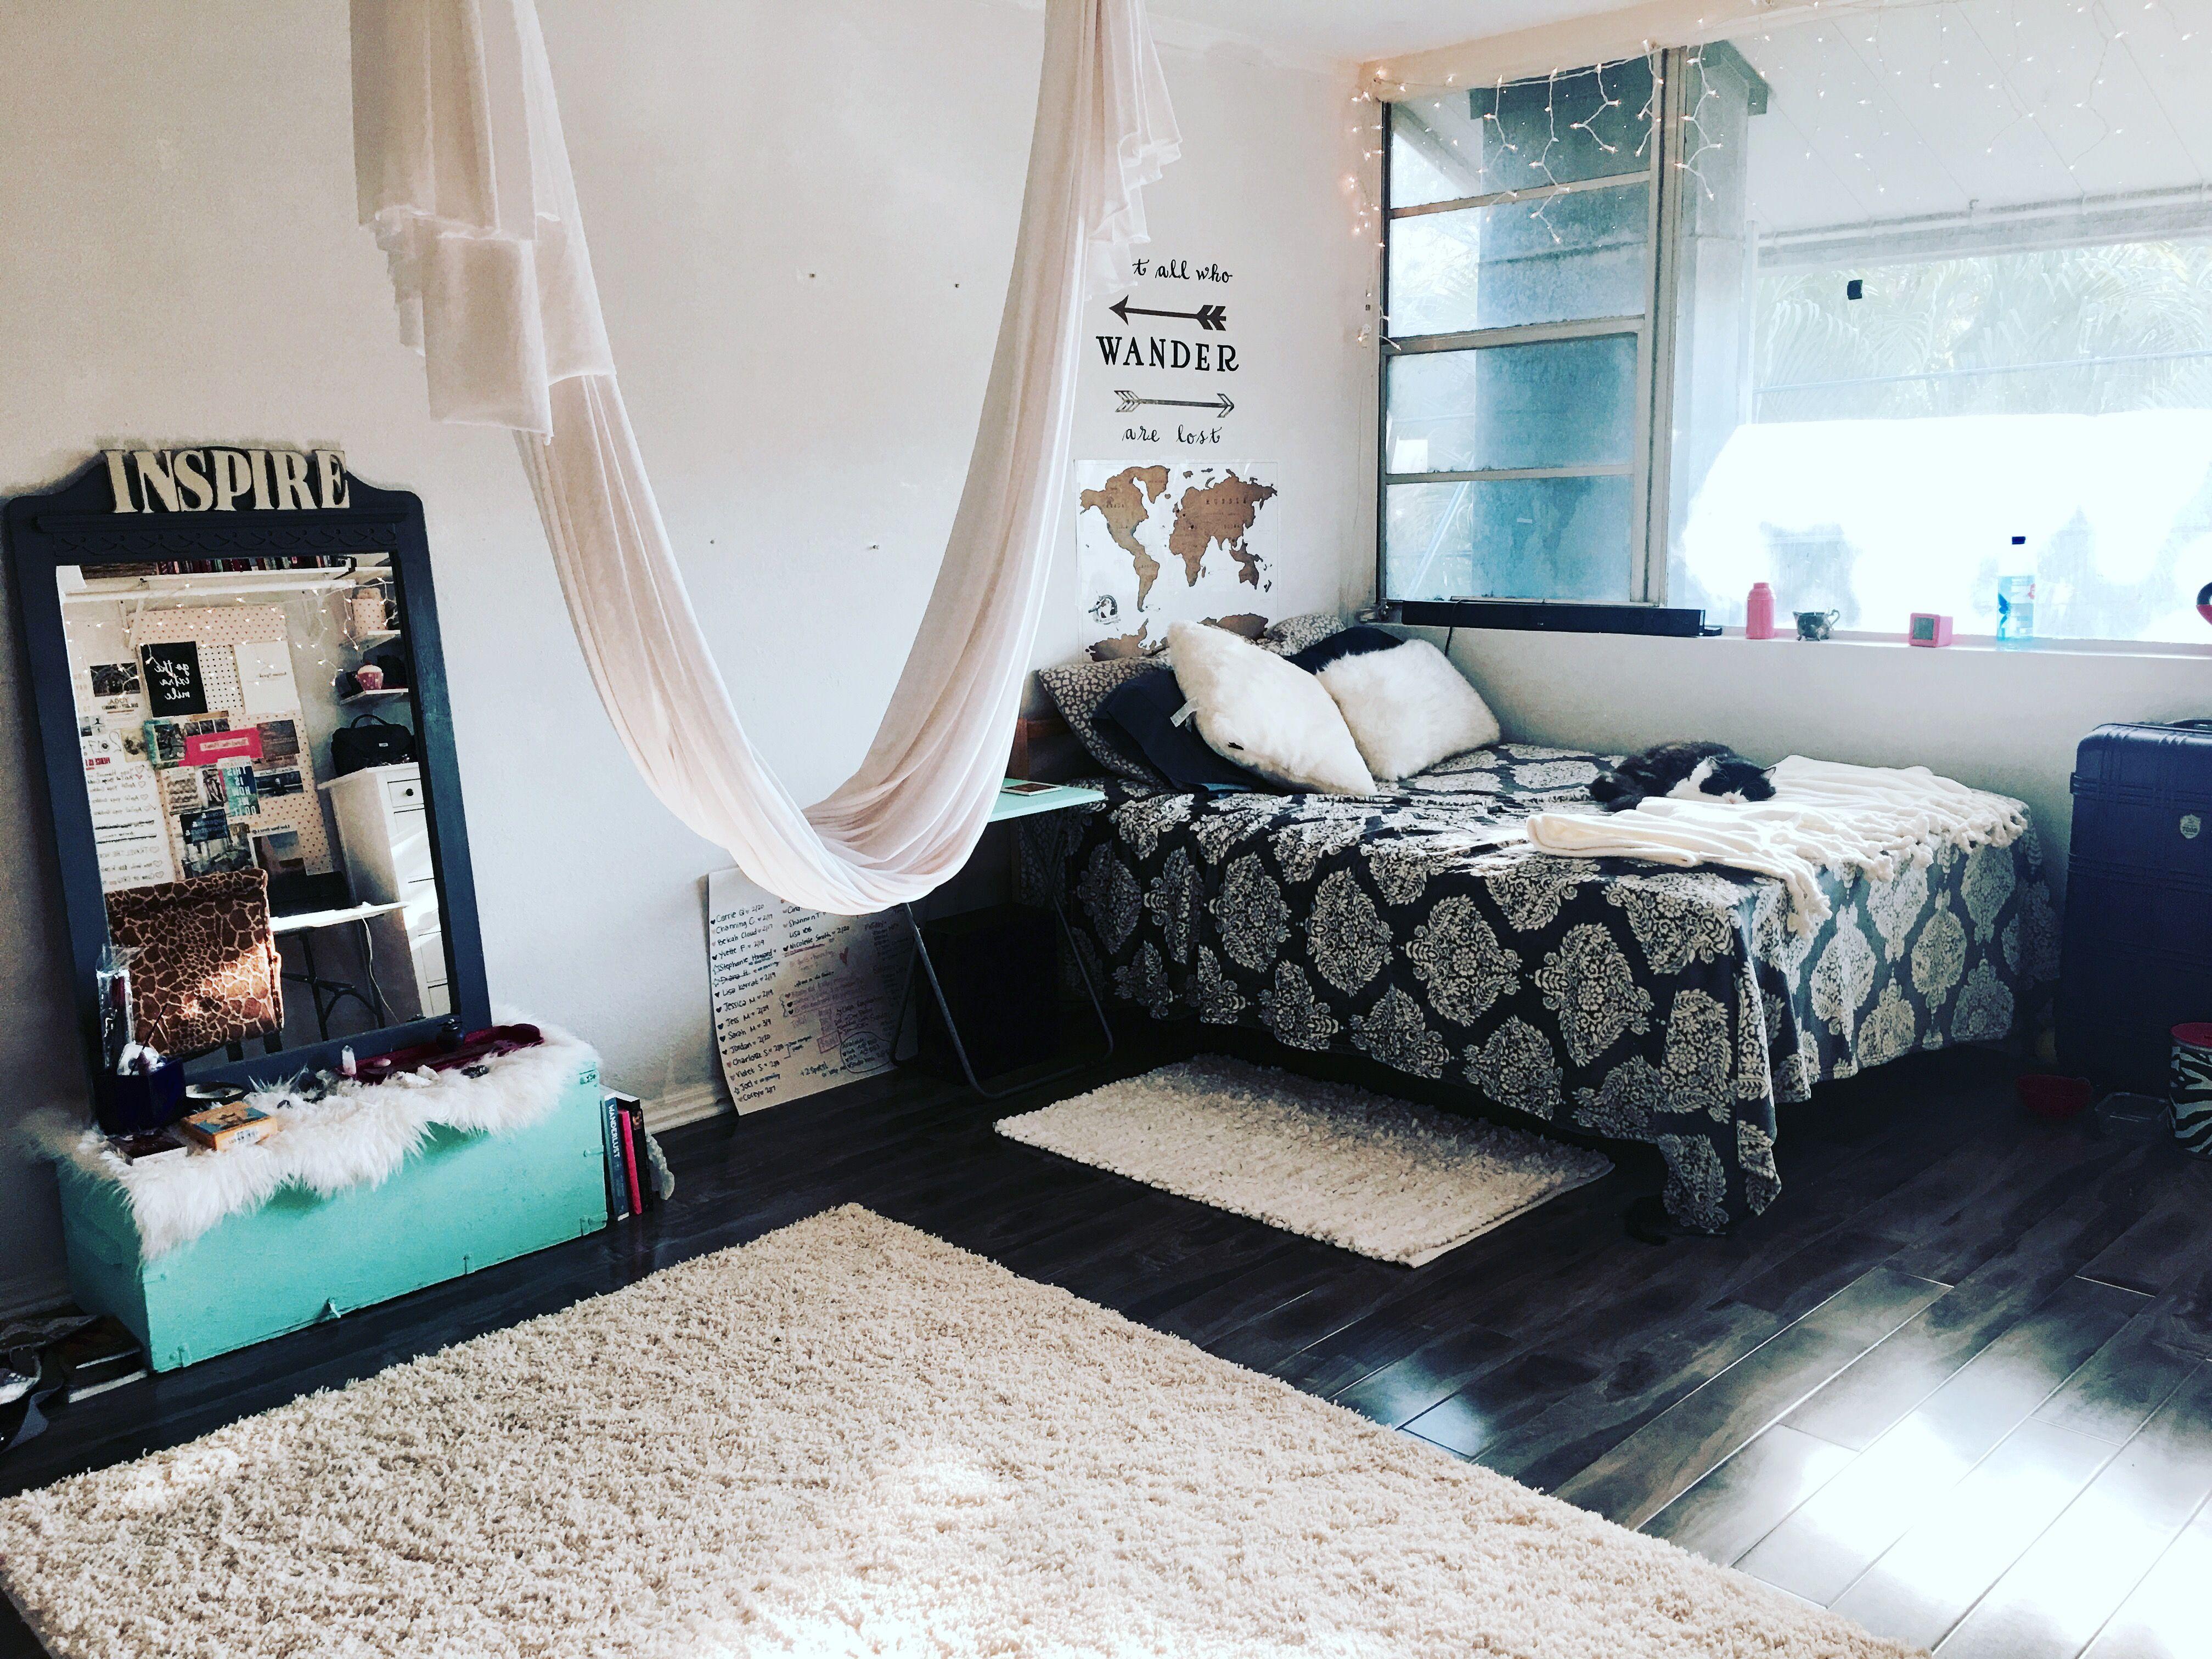 Pin By Margie Pargie On Aerial Yoga Tutorials Inspiration Home Yoga Room Aerial Yoga Hammock Hammock In Bedroom